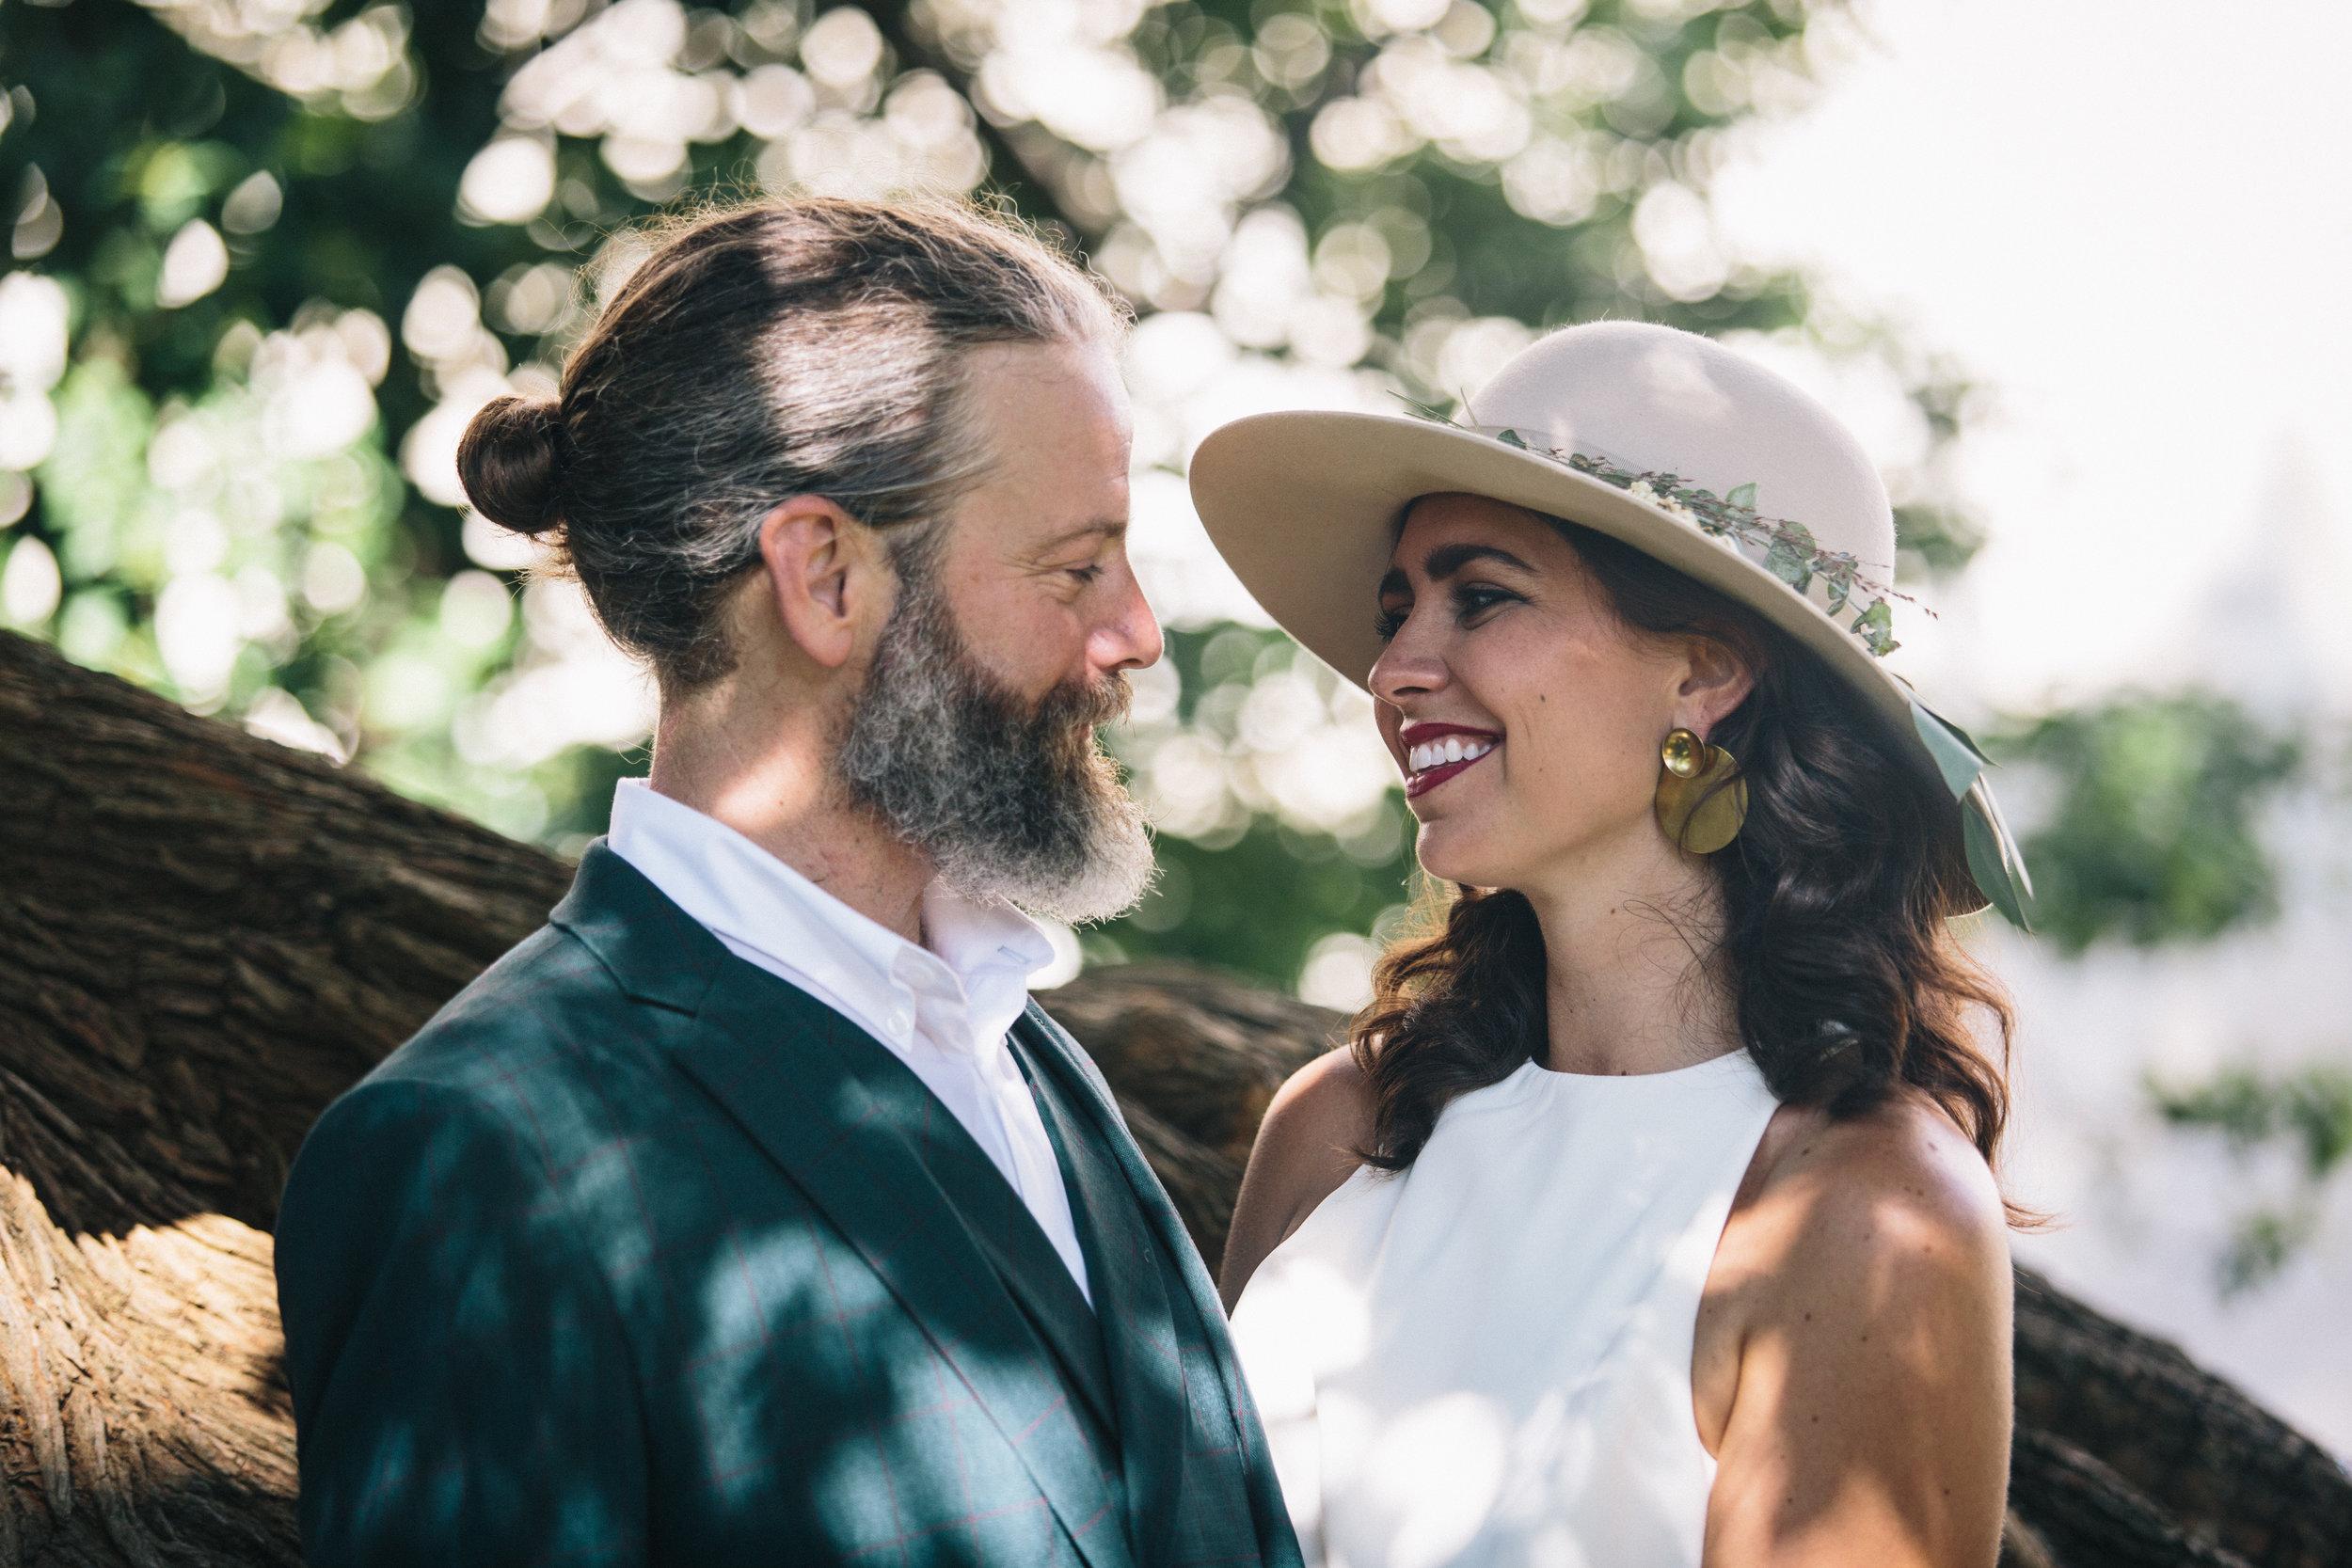 Harlan_LeeHart_Wedding-58.jpg